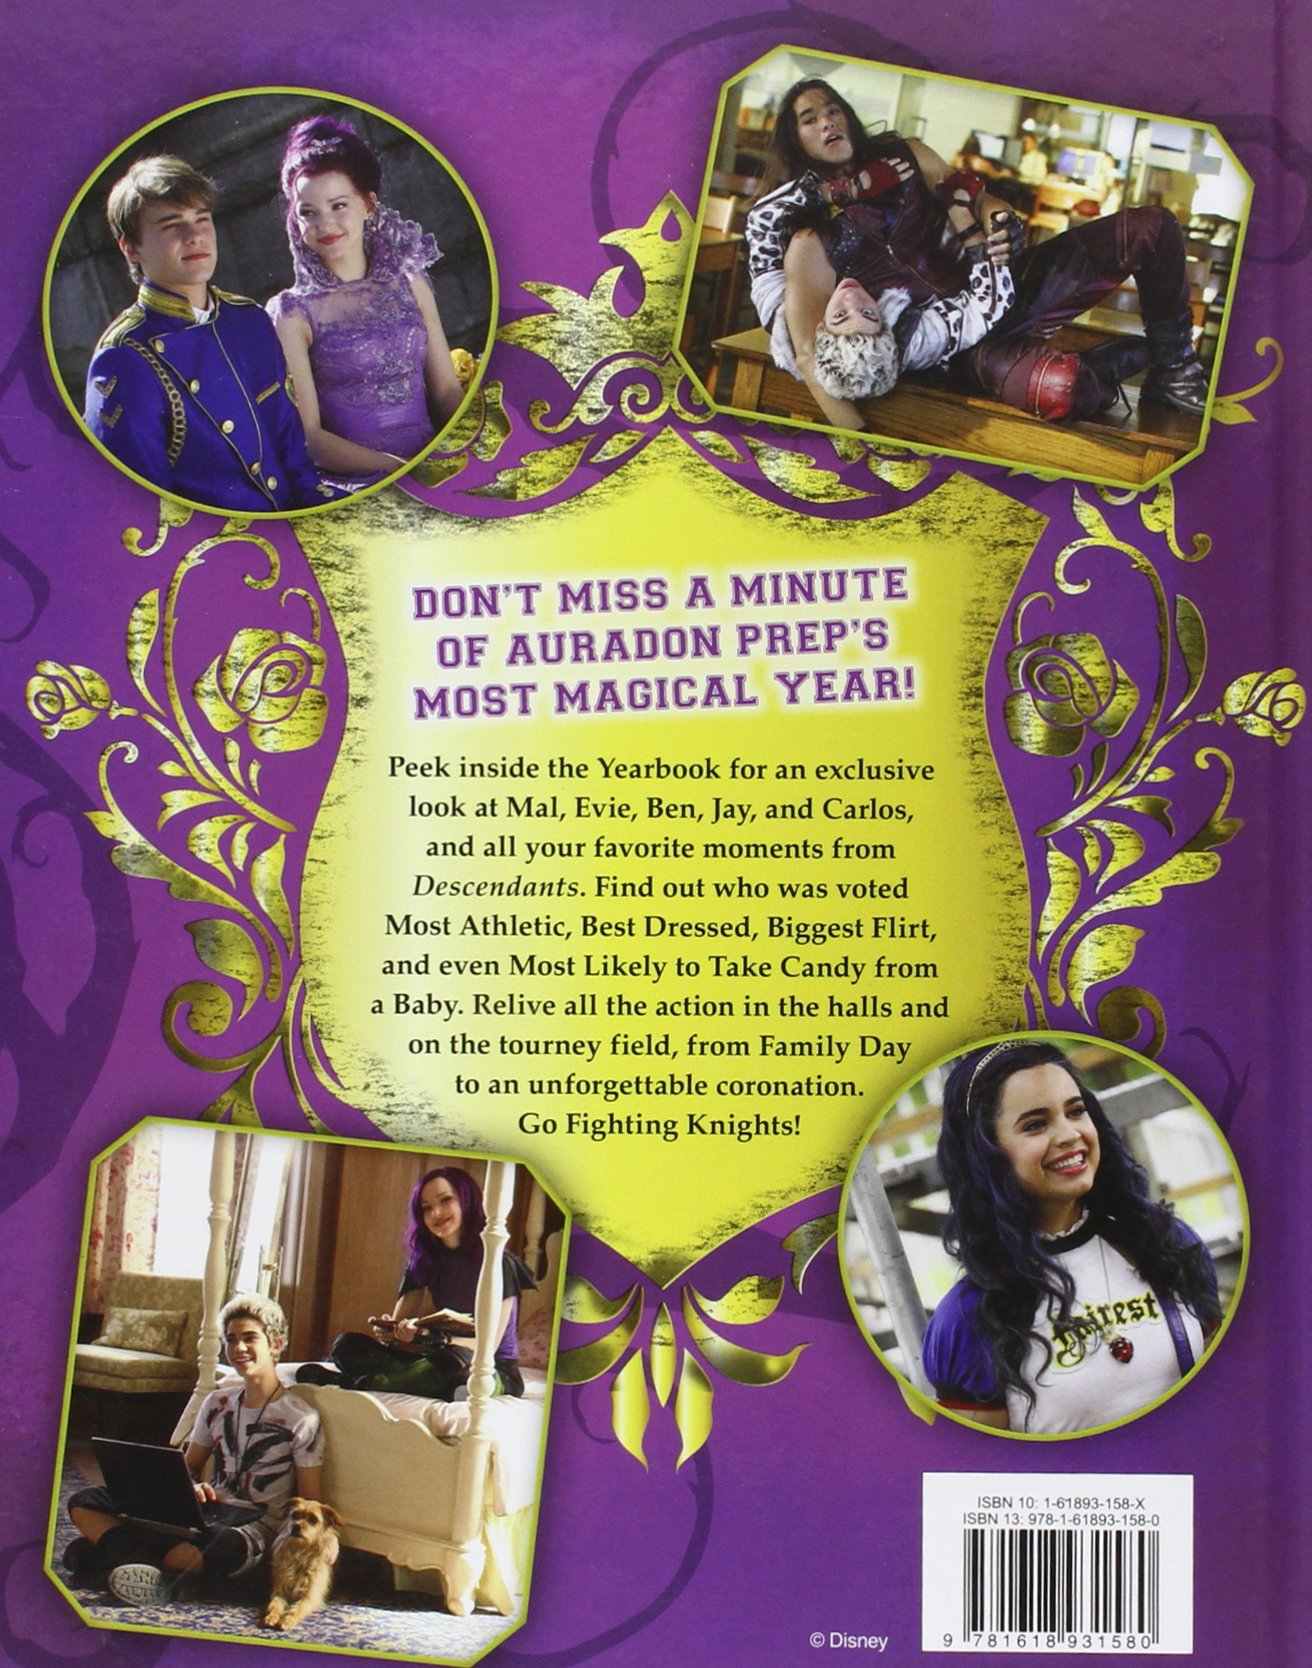 Disney Descendants Yearbook: Disney: 9781618931580: Amazon